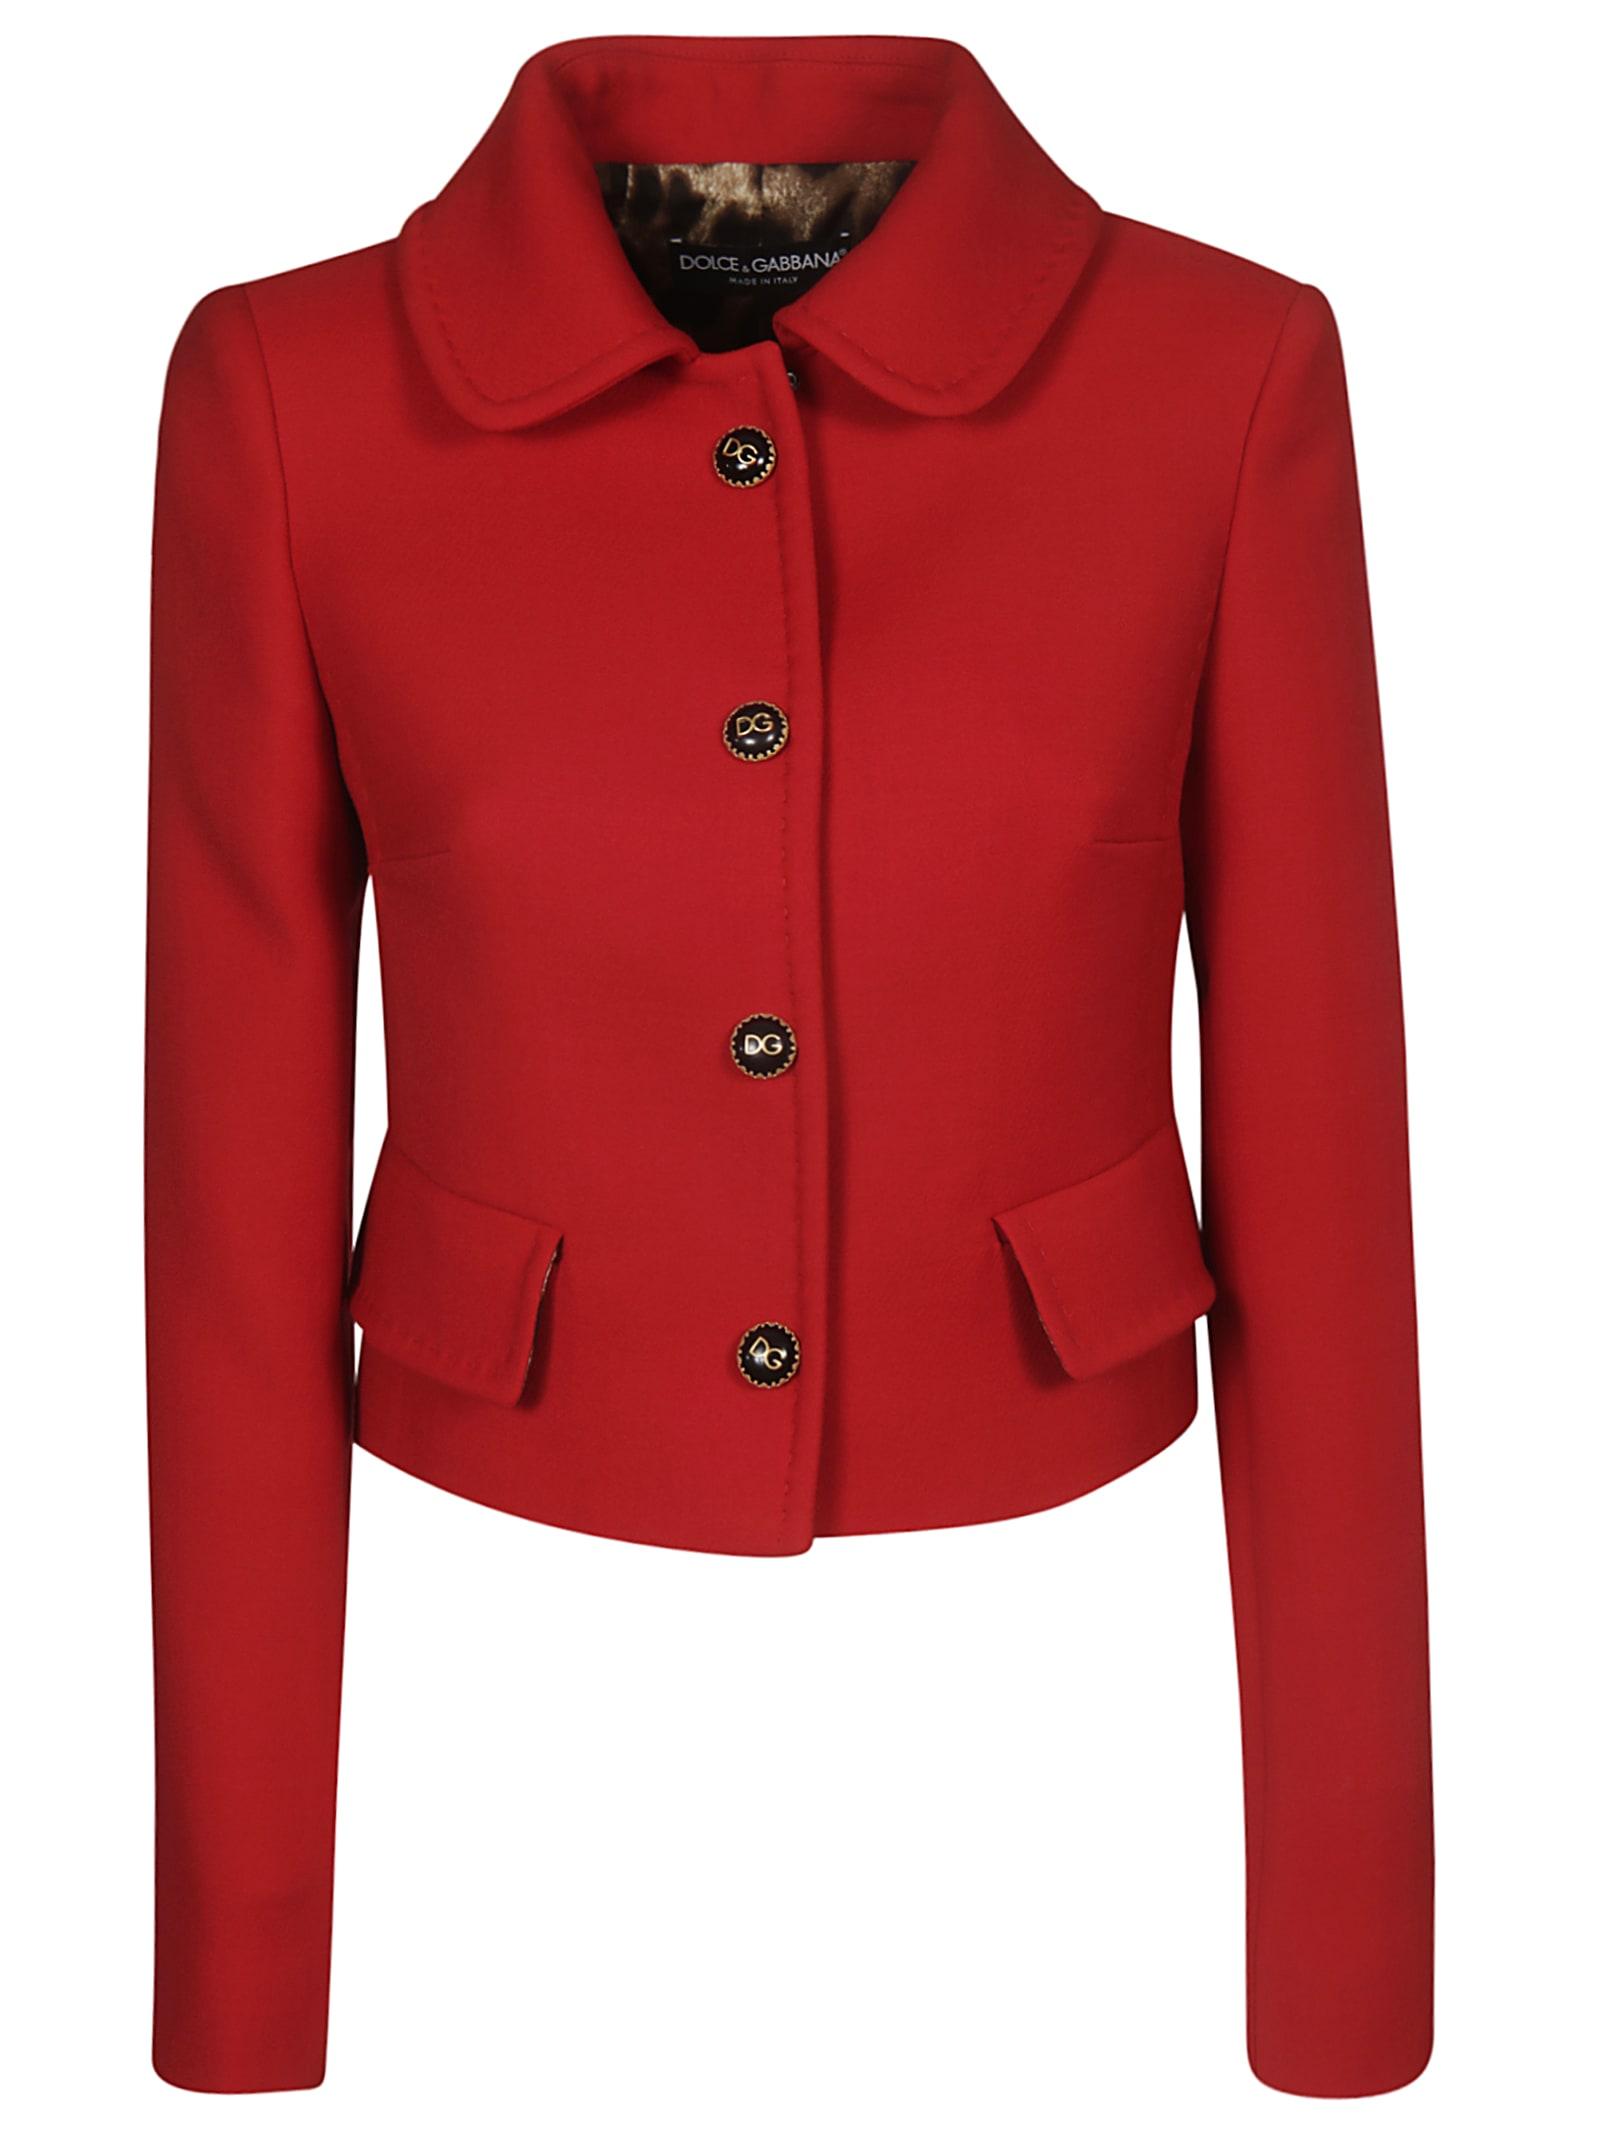 Dolce & Gabbana Buttoned Jacket